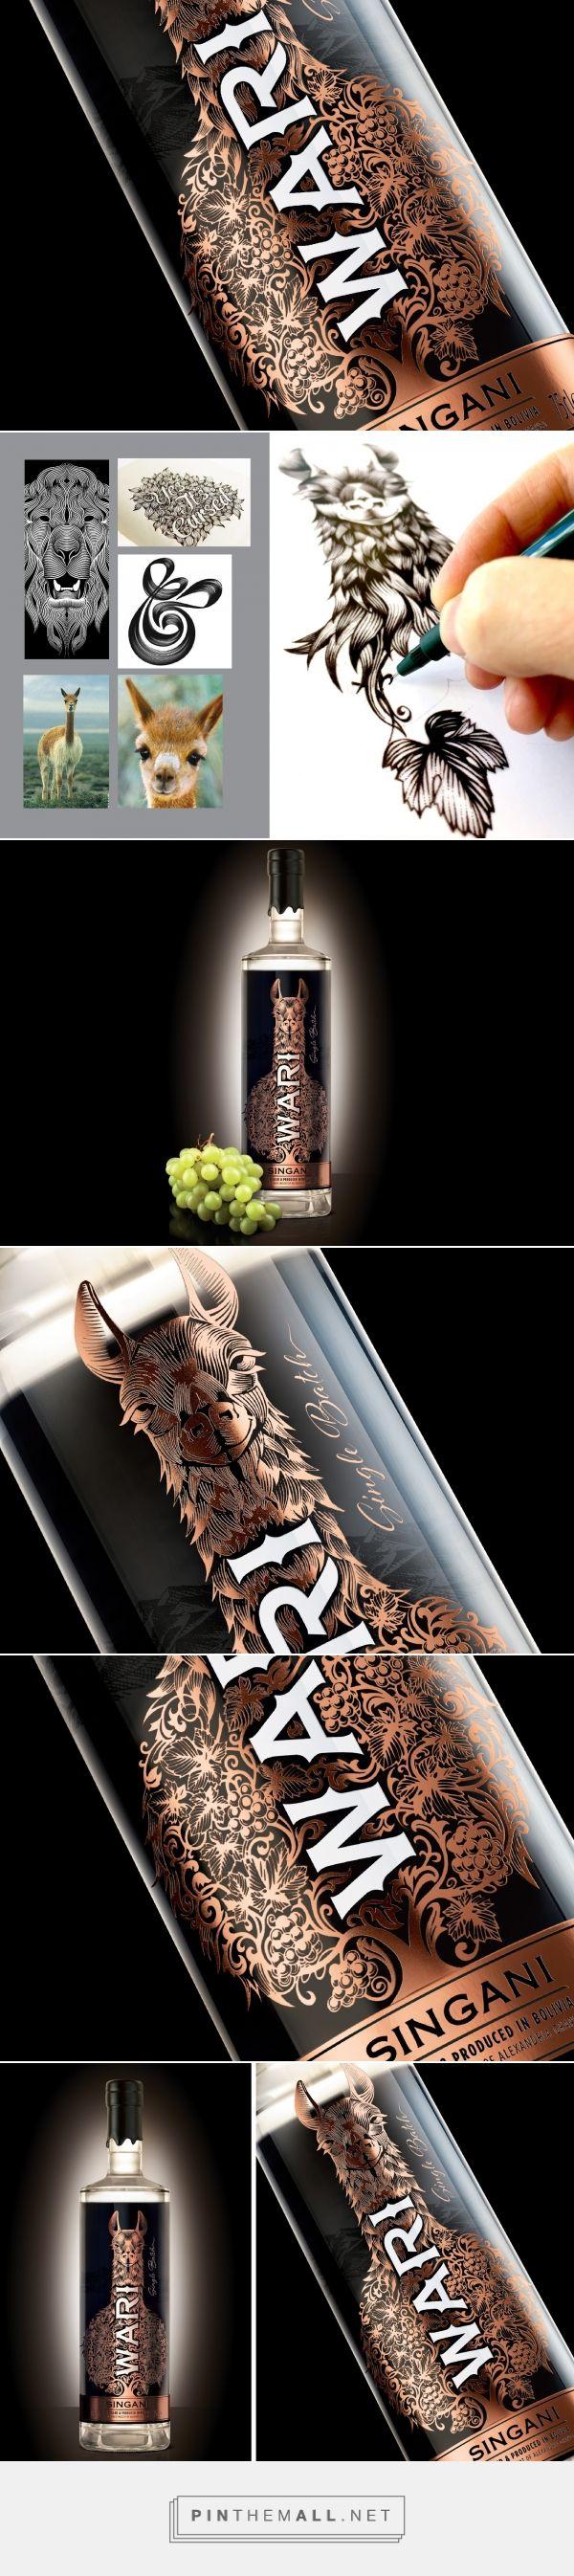 Wari Singani (Tierra Alta) packaging concept by Love Mondays Branding - http://www.packagingoftheworld.com/2017/04/wari-singani-tierra-alta-concept.html